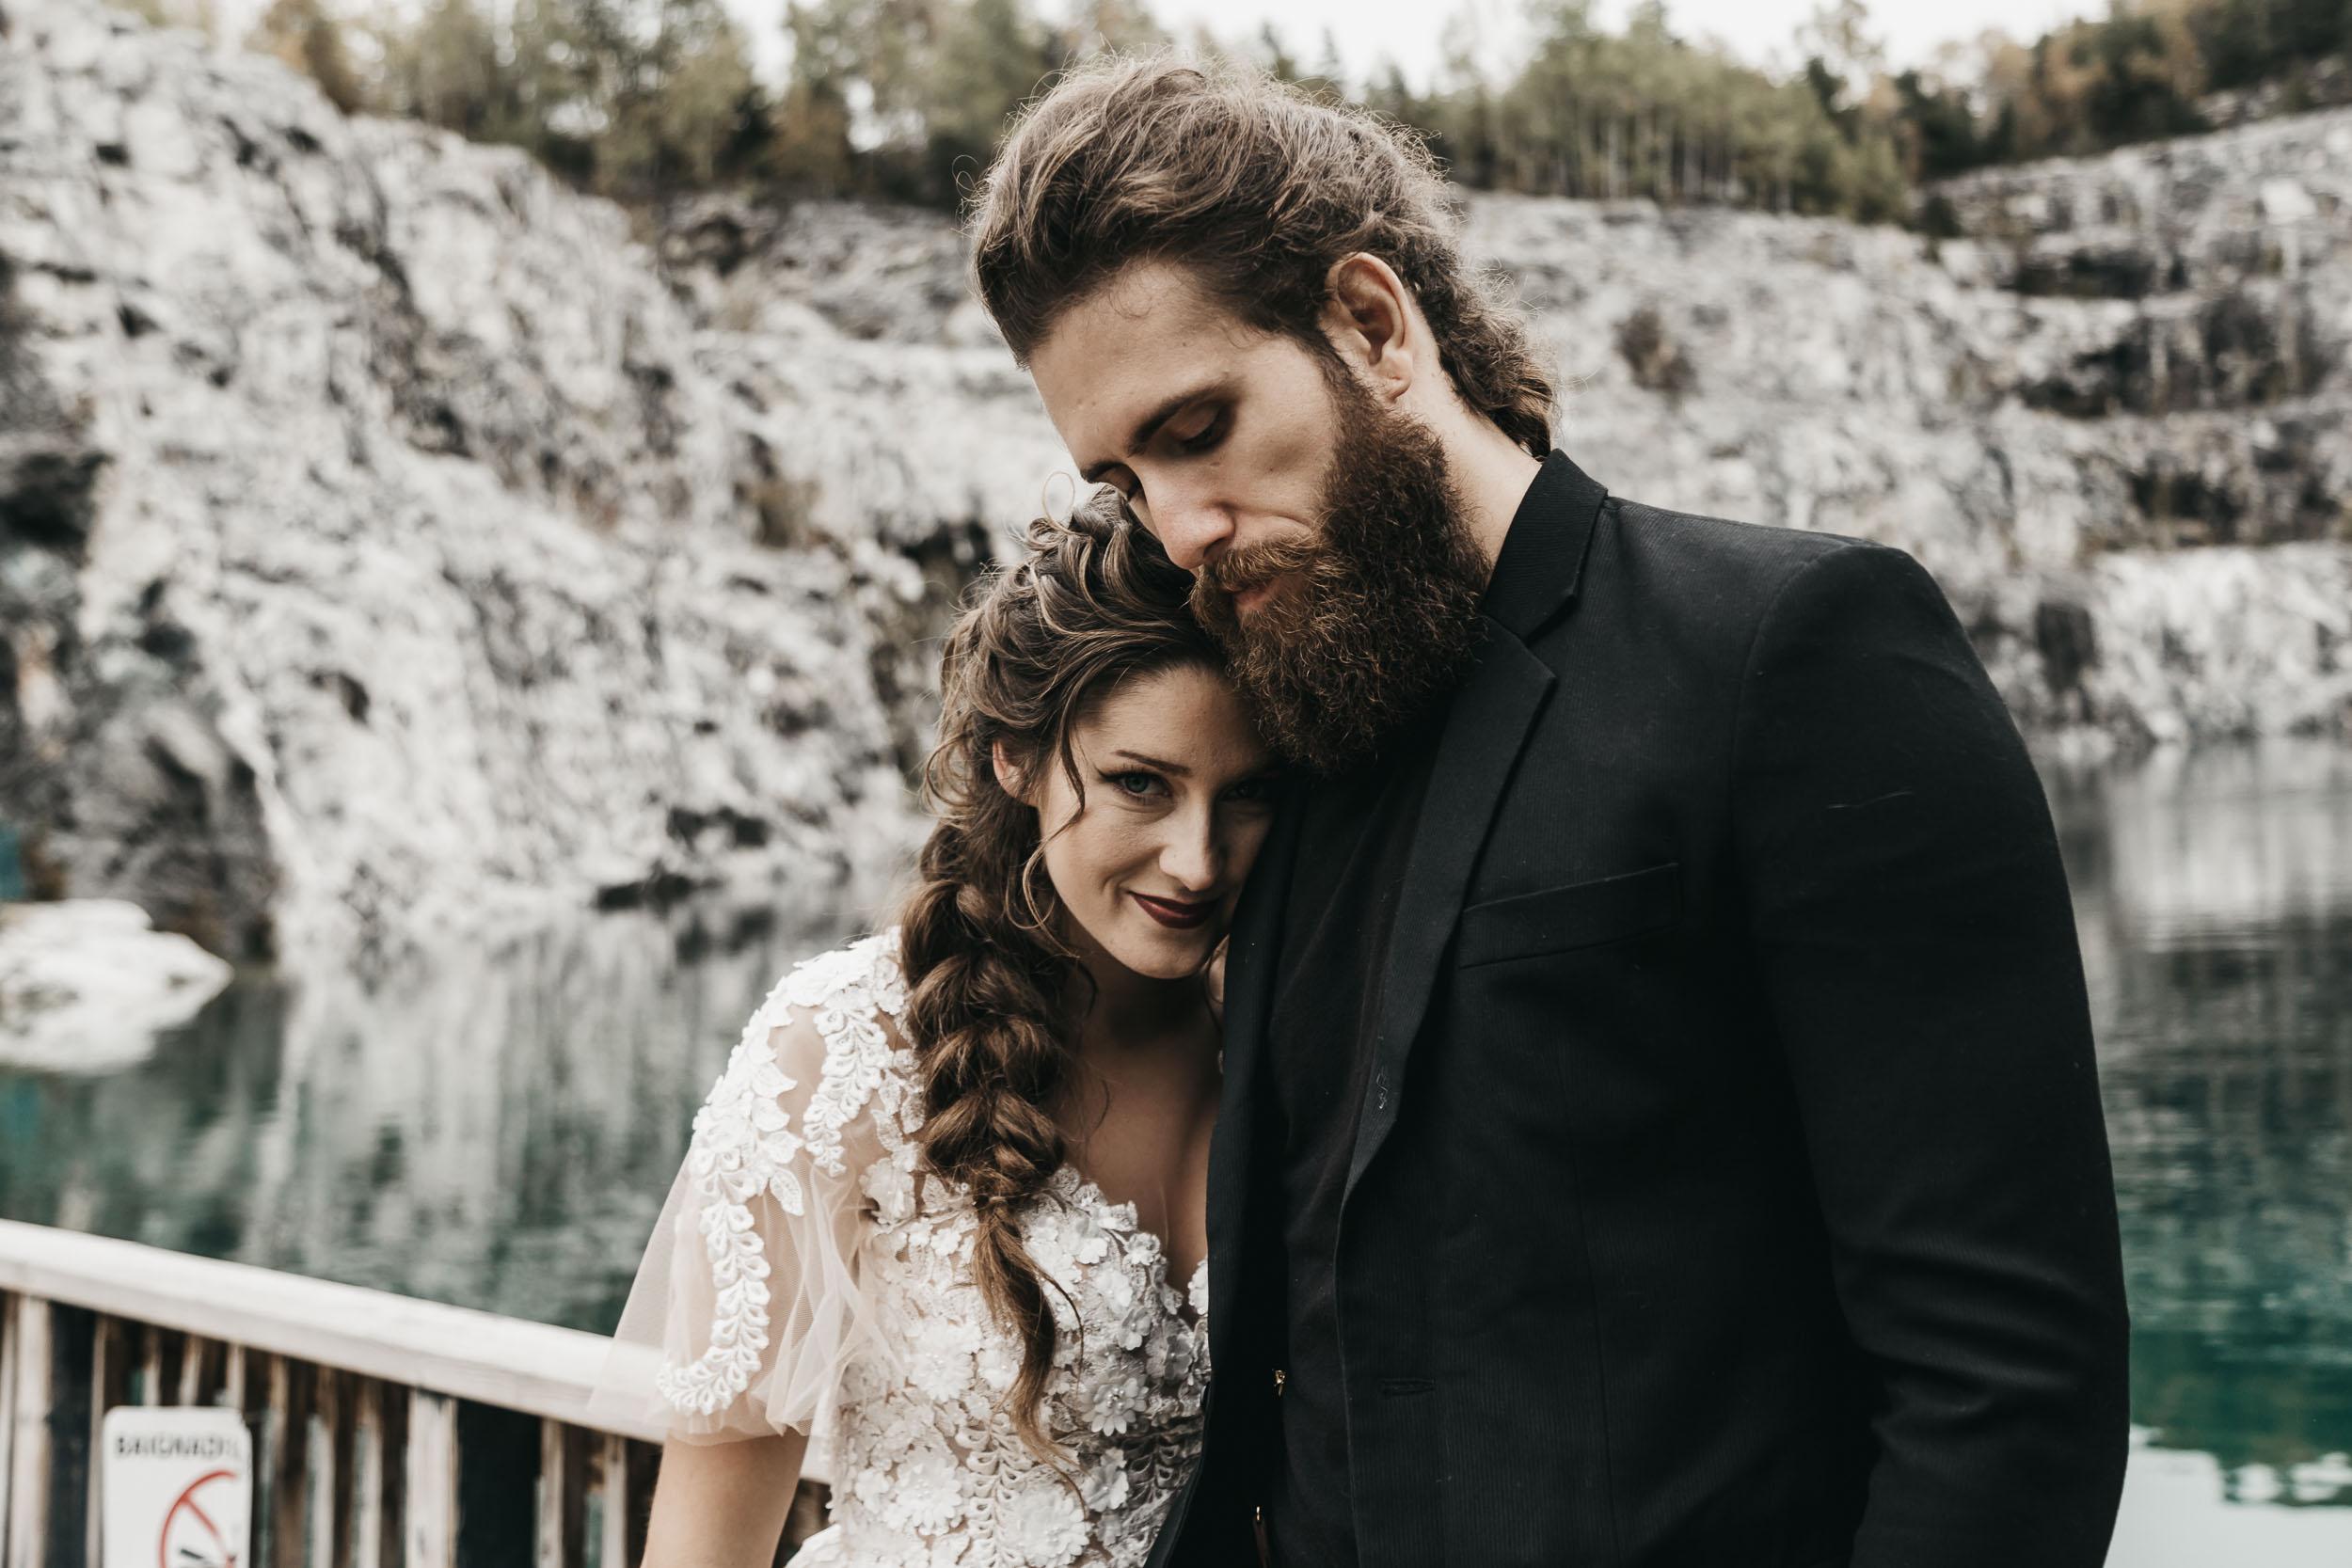 intimate-wedding-elopement-photographer-ottawa-toronto-0207.jpg